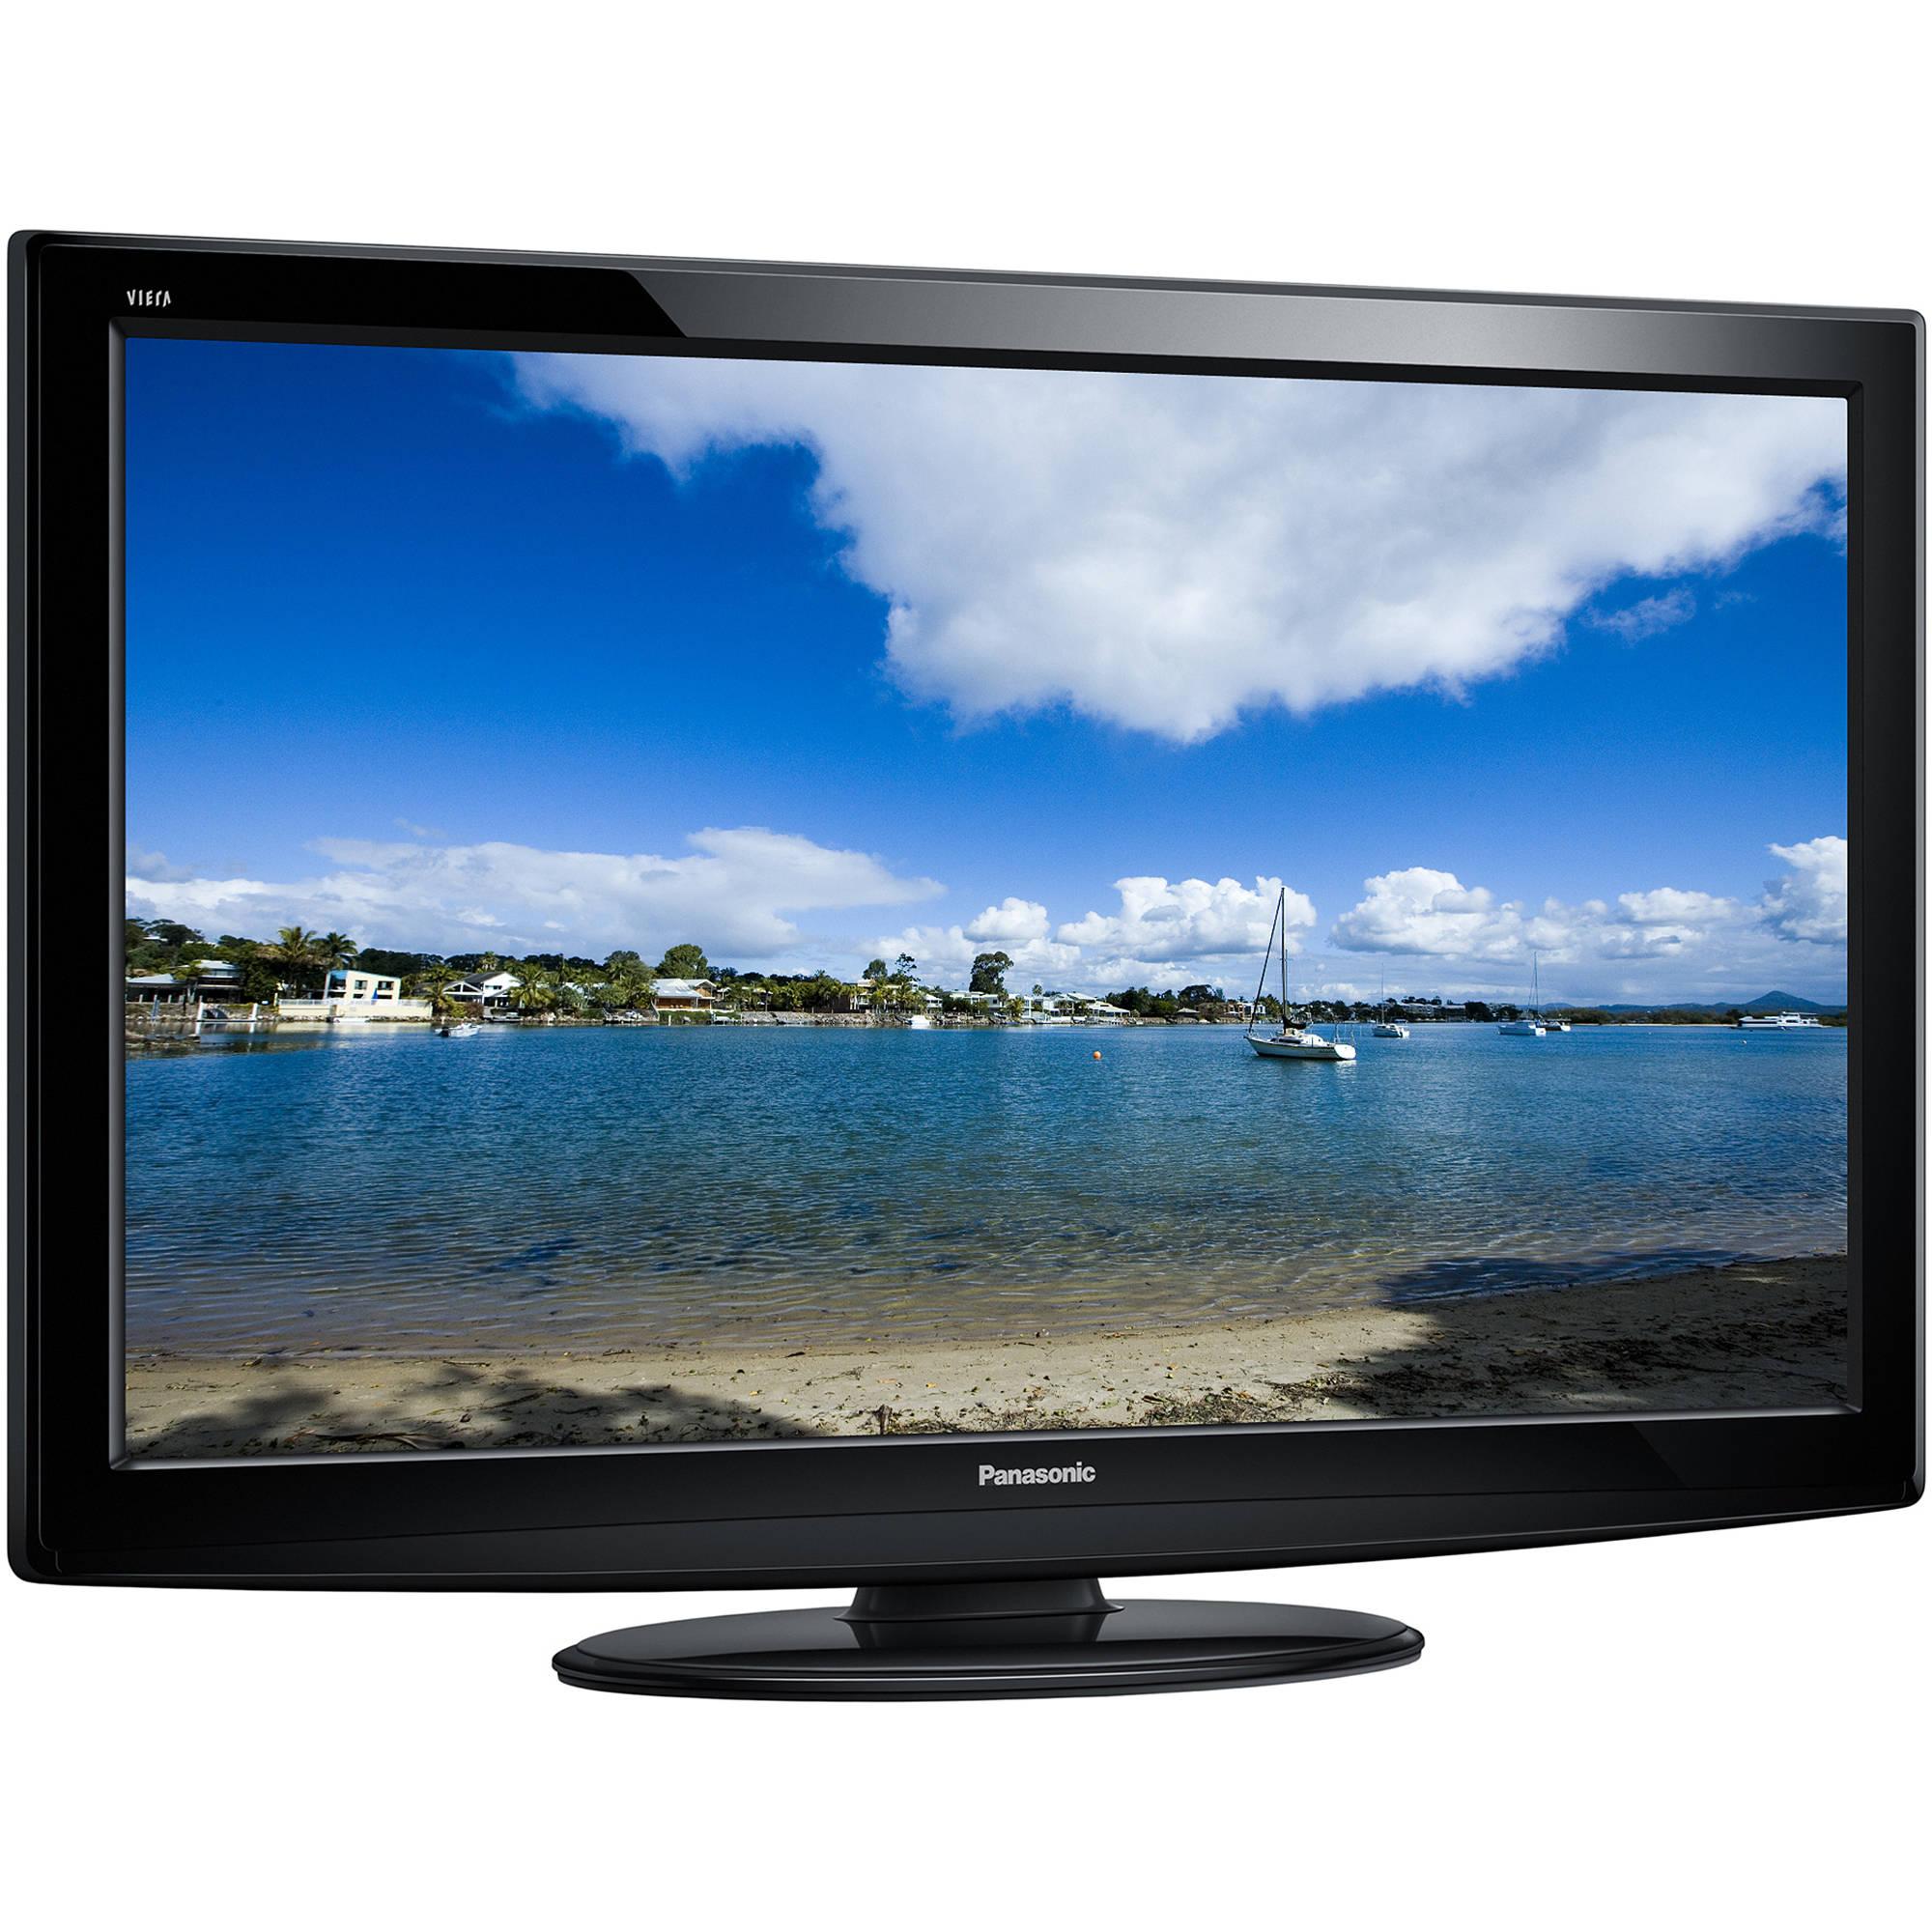 Panasonic Tc L37u22 37 Viera P Lcd Tv Tc L37u22 B Amp H